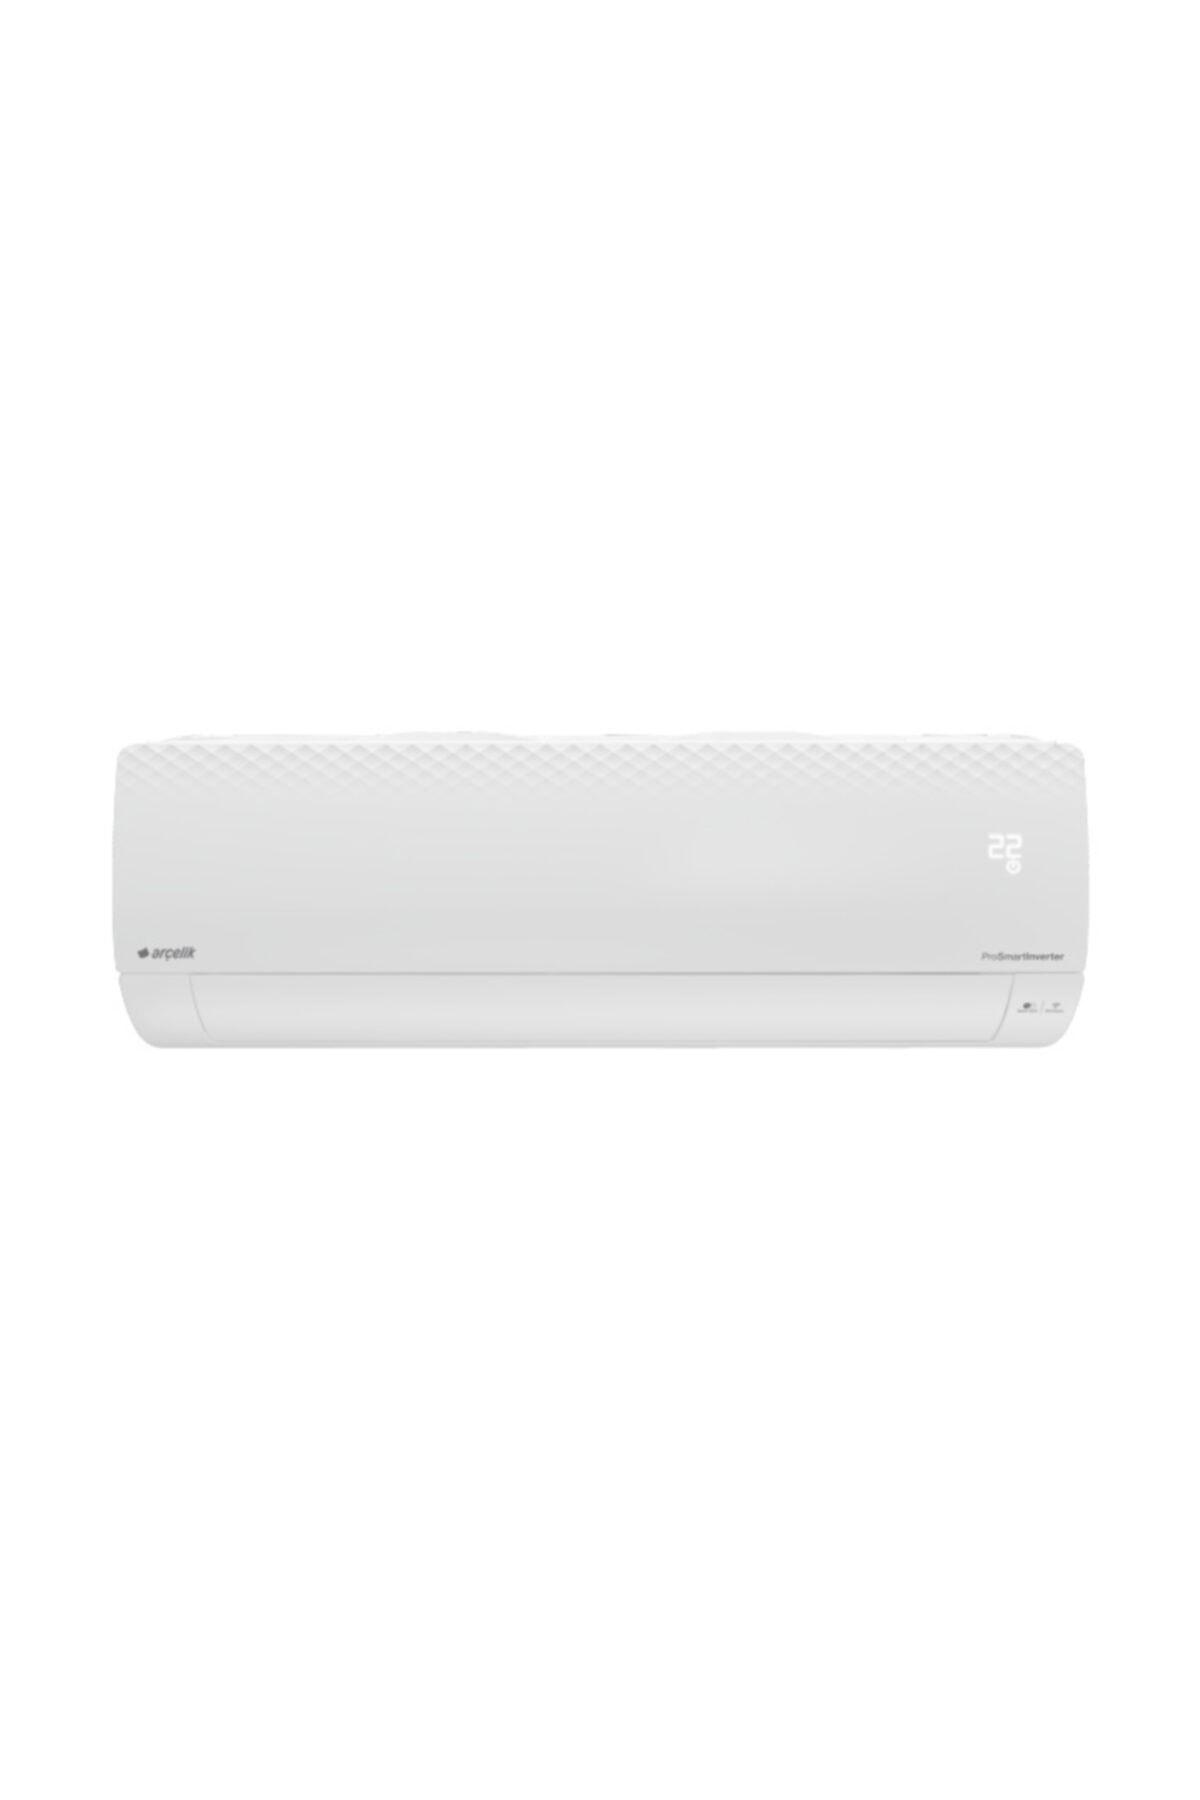 18340 18000 BTU A++ Sınıfı Prosmart Inverter Wifi Split Klima